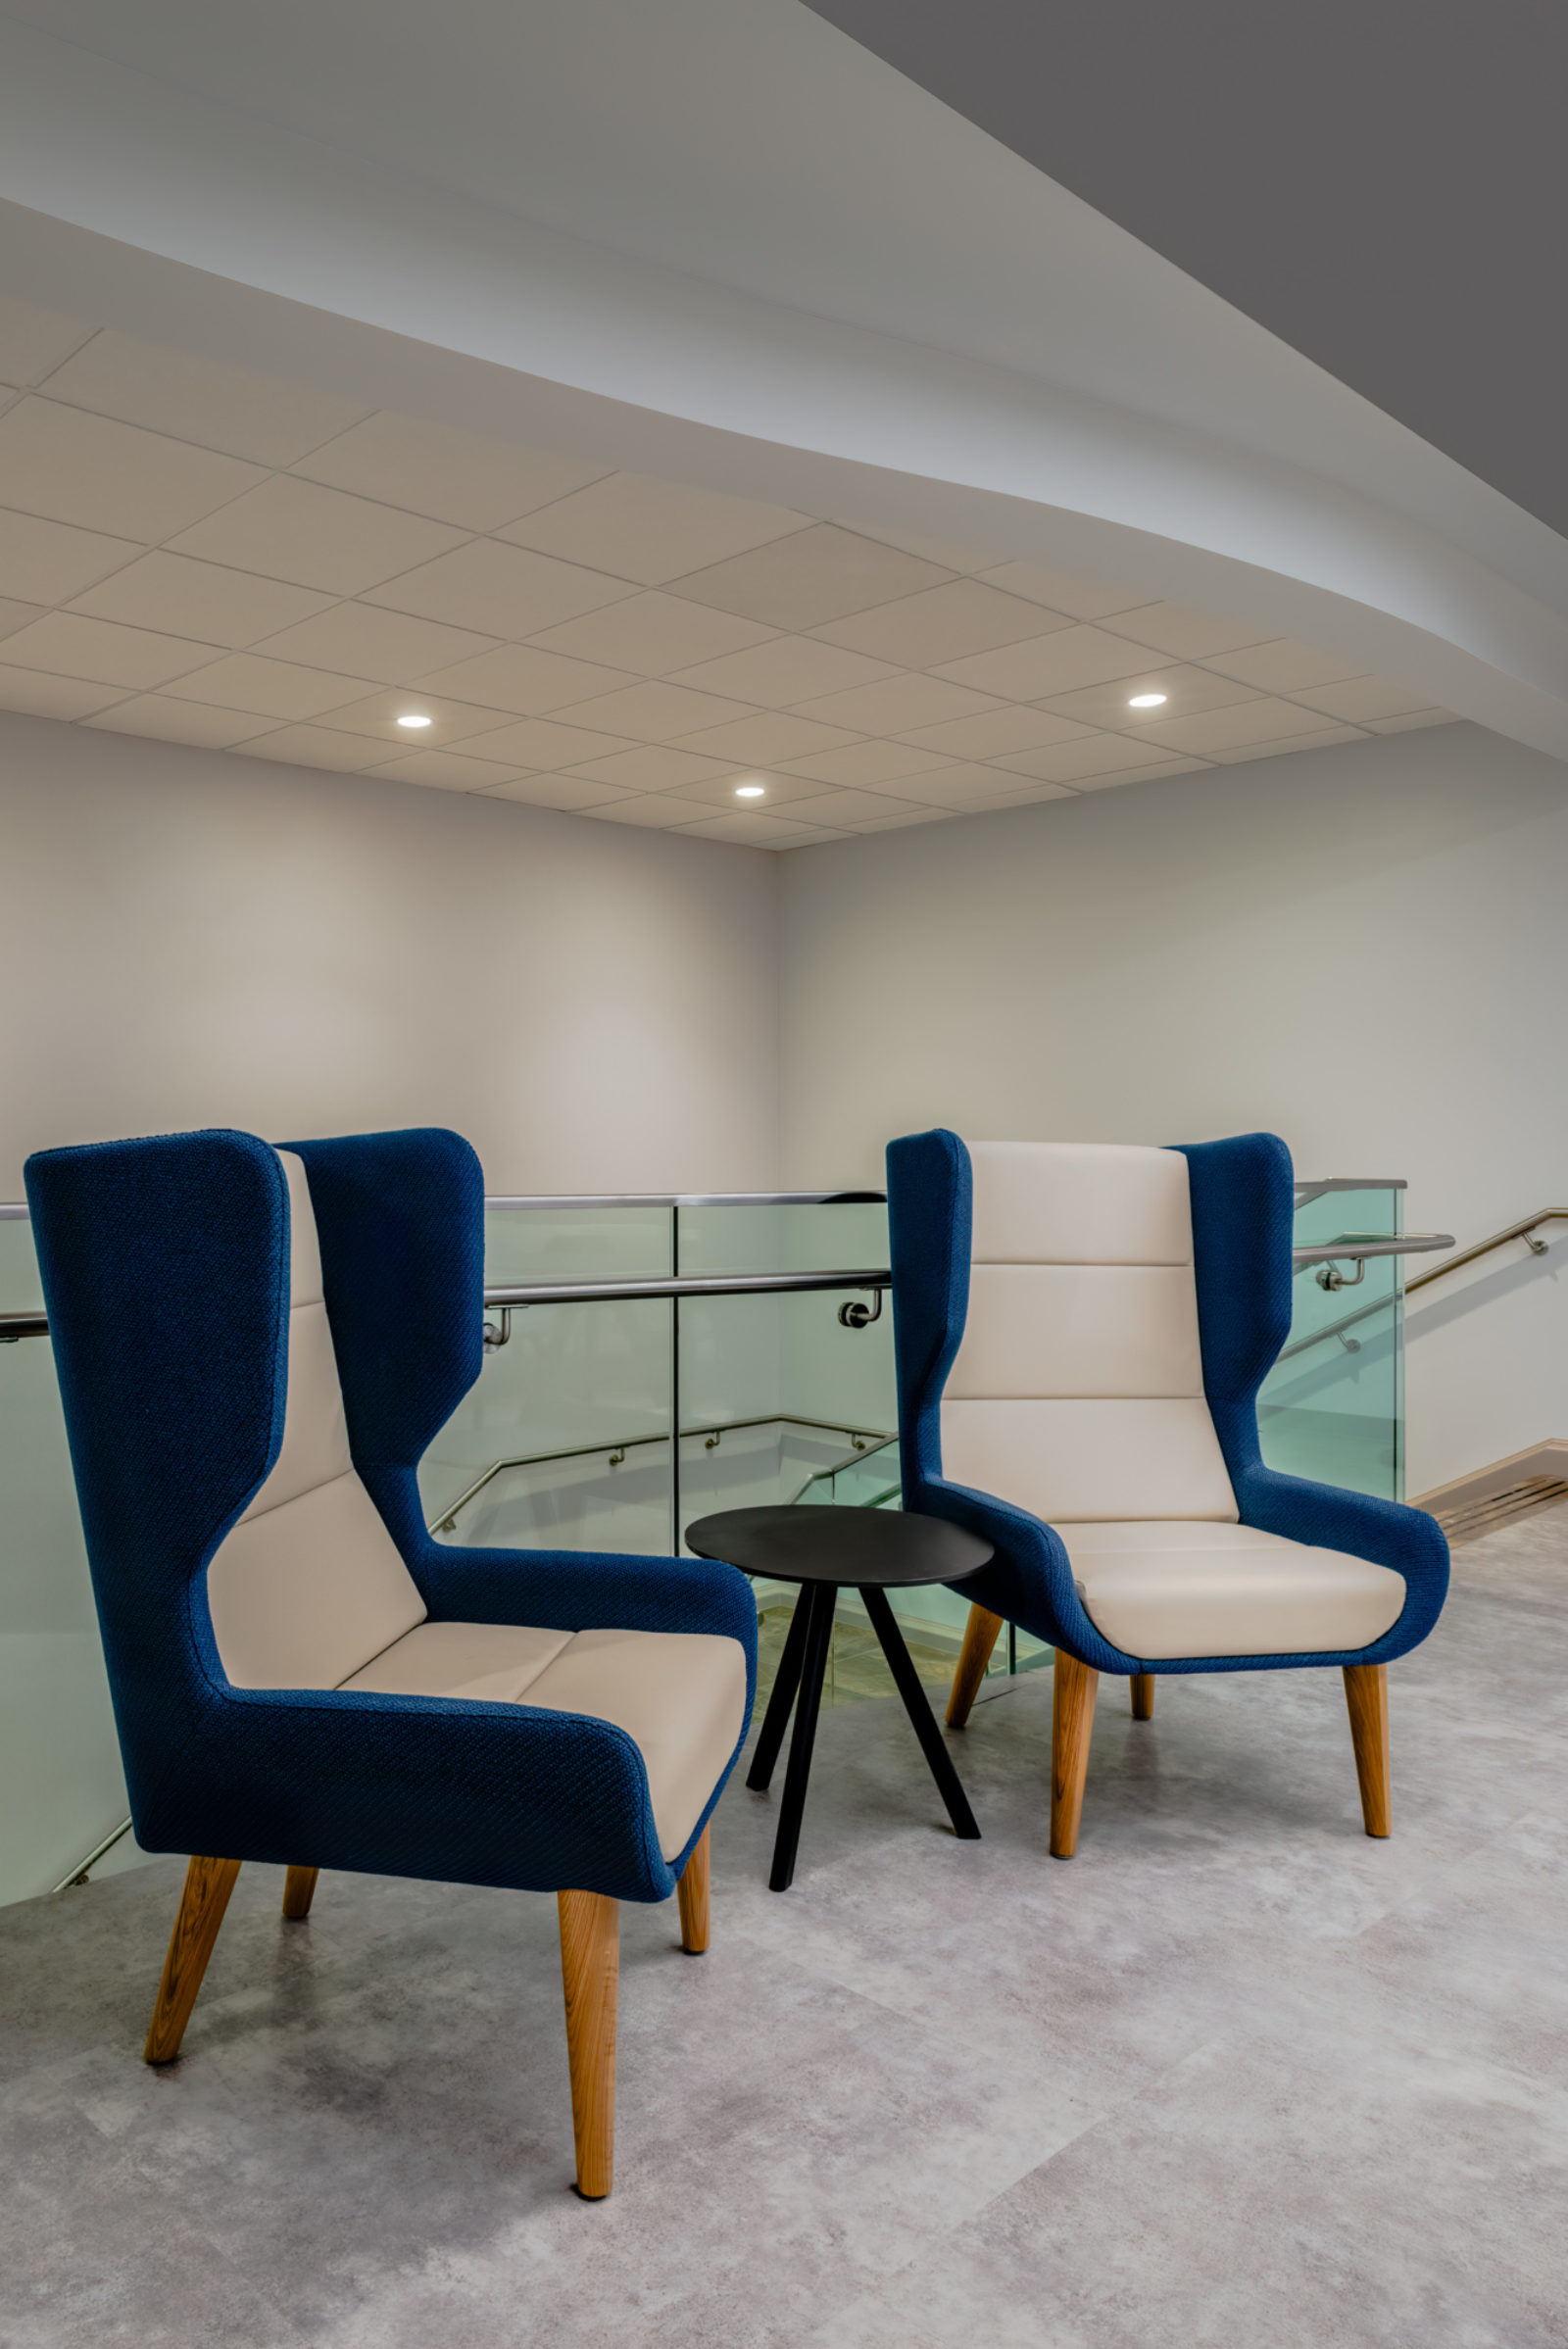 northwestern mutual office chairs